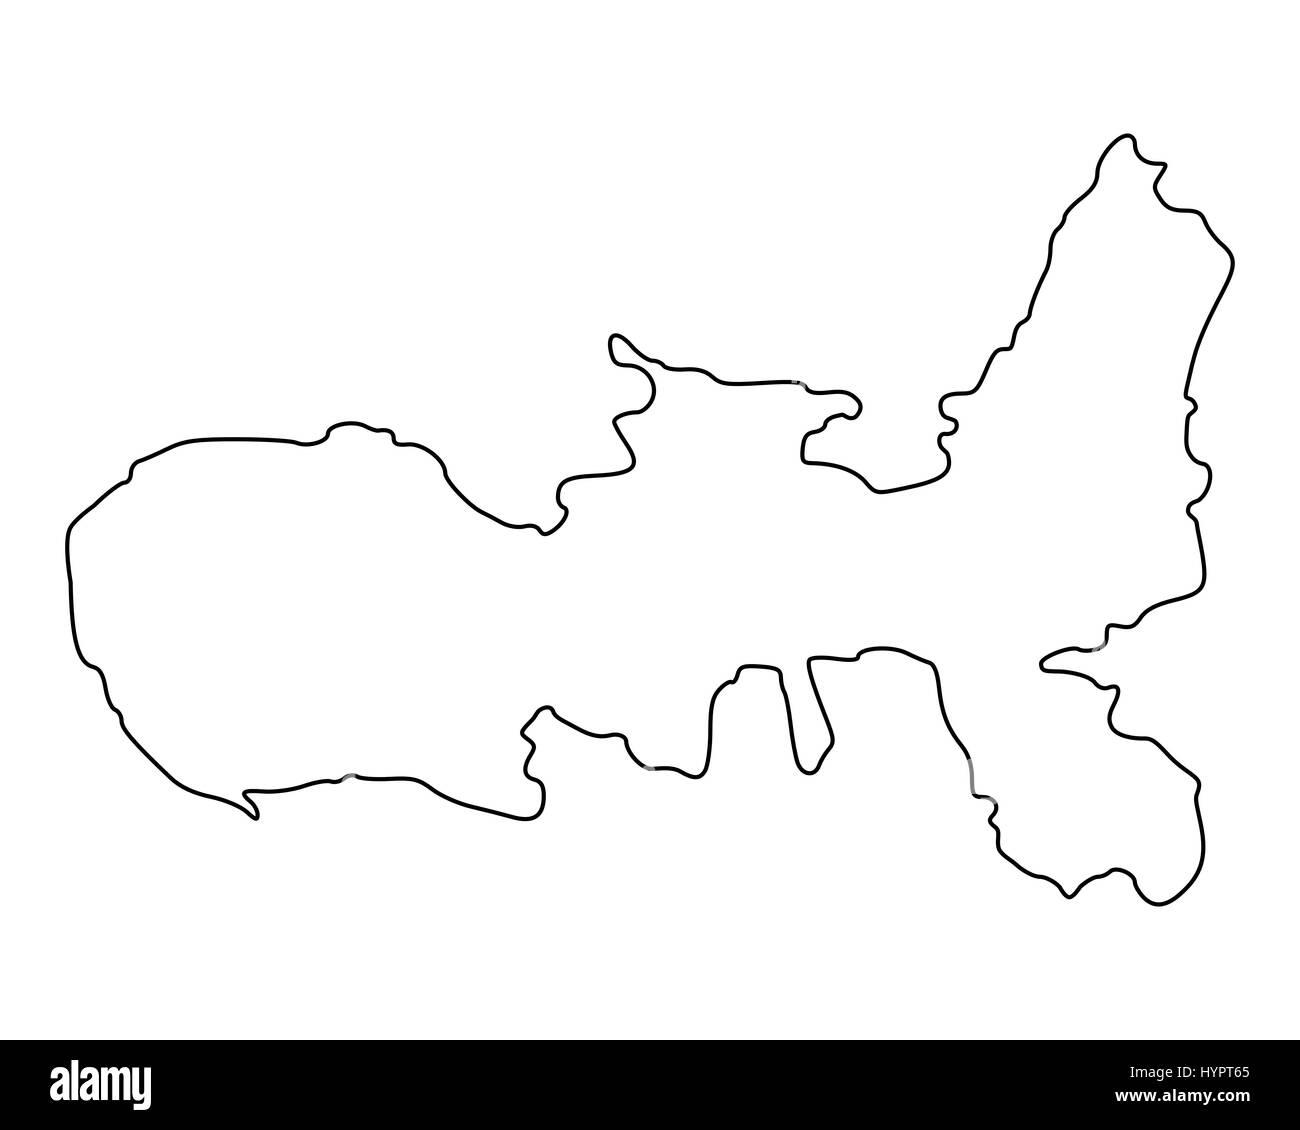 Insel Elba Karte.Karte Der Insel Elba Stockfoto Bild 137570221 Alamy